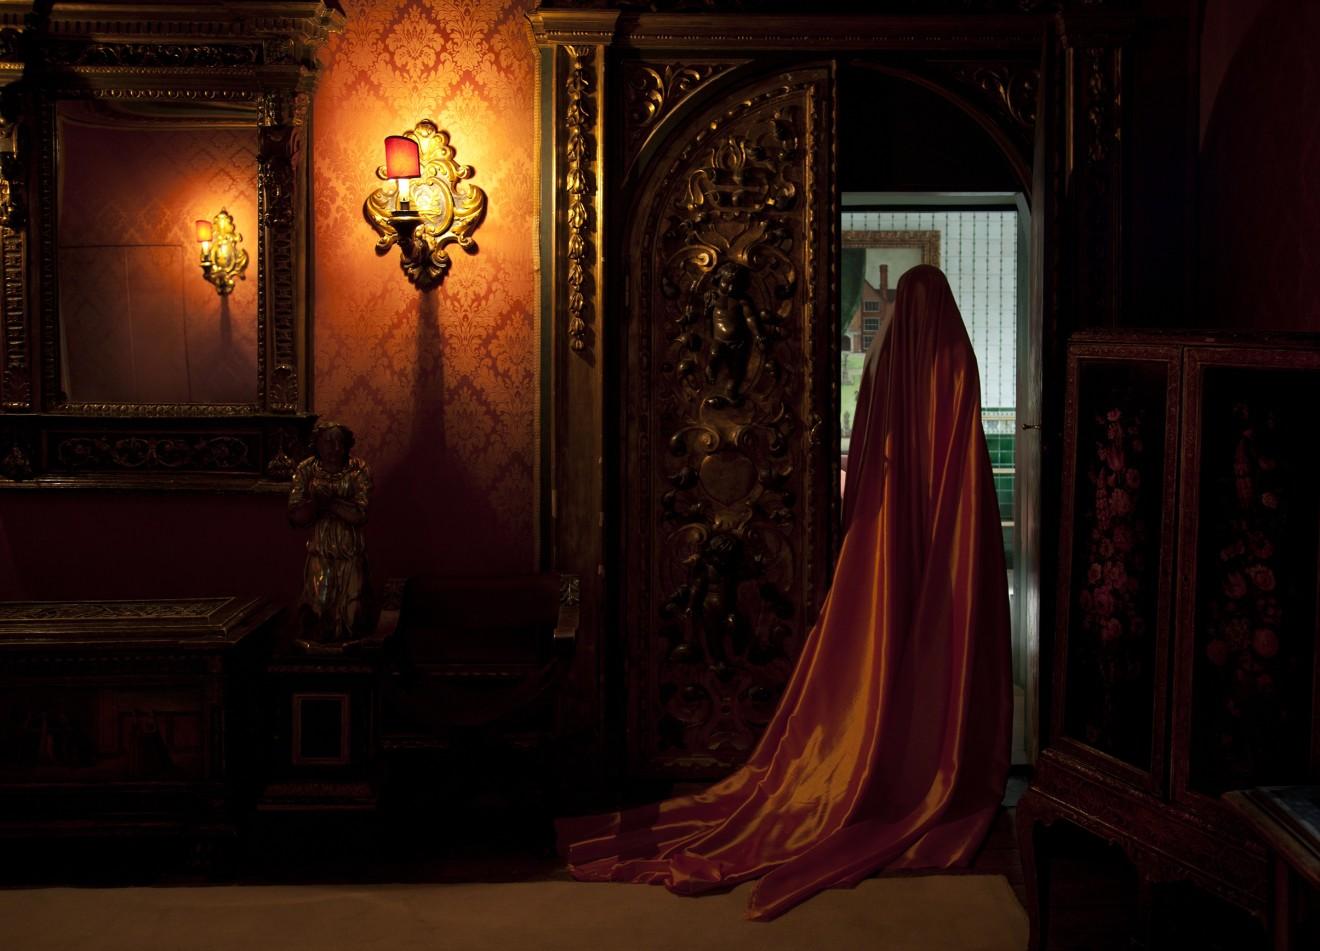 Güler Ates, Orange Reflection, 2011